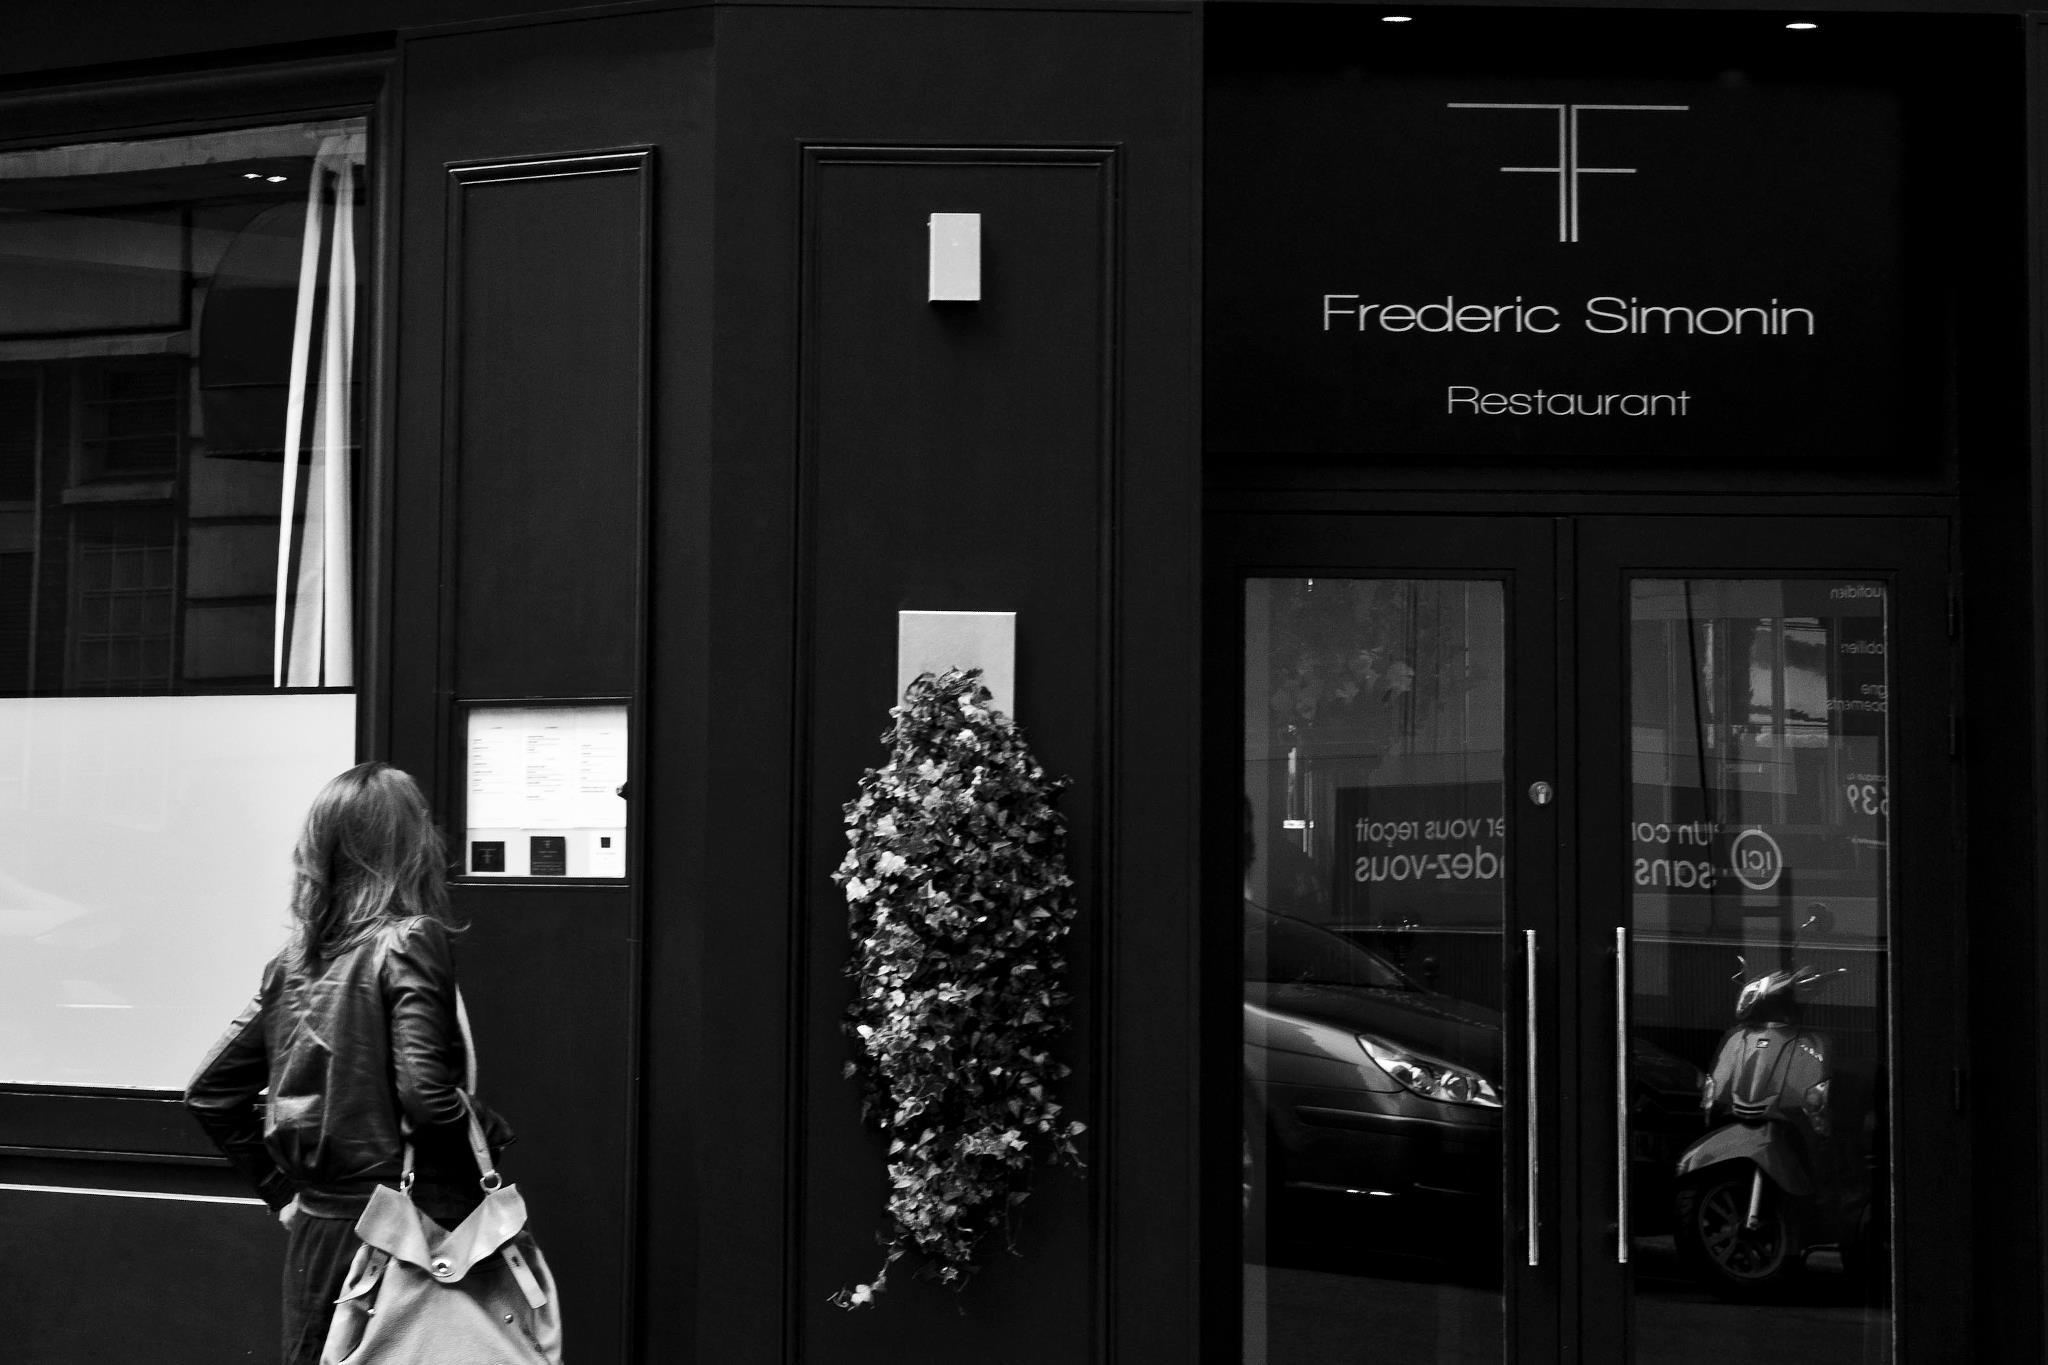 Adhérent RESTAURANT FREDERIC SIMONIN - photo #2726